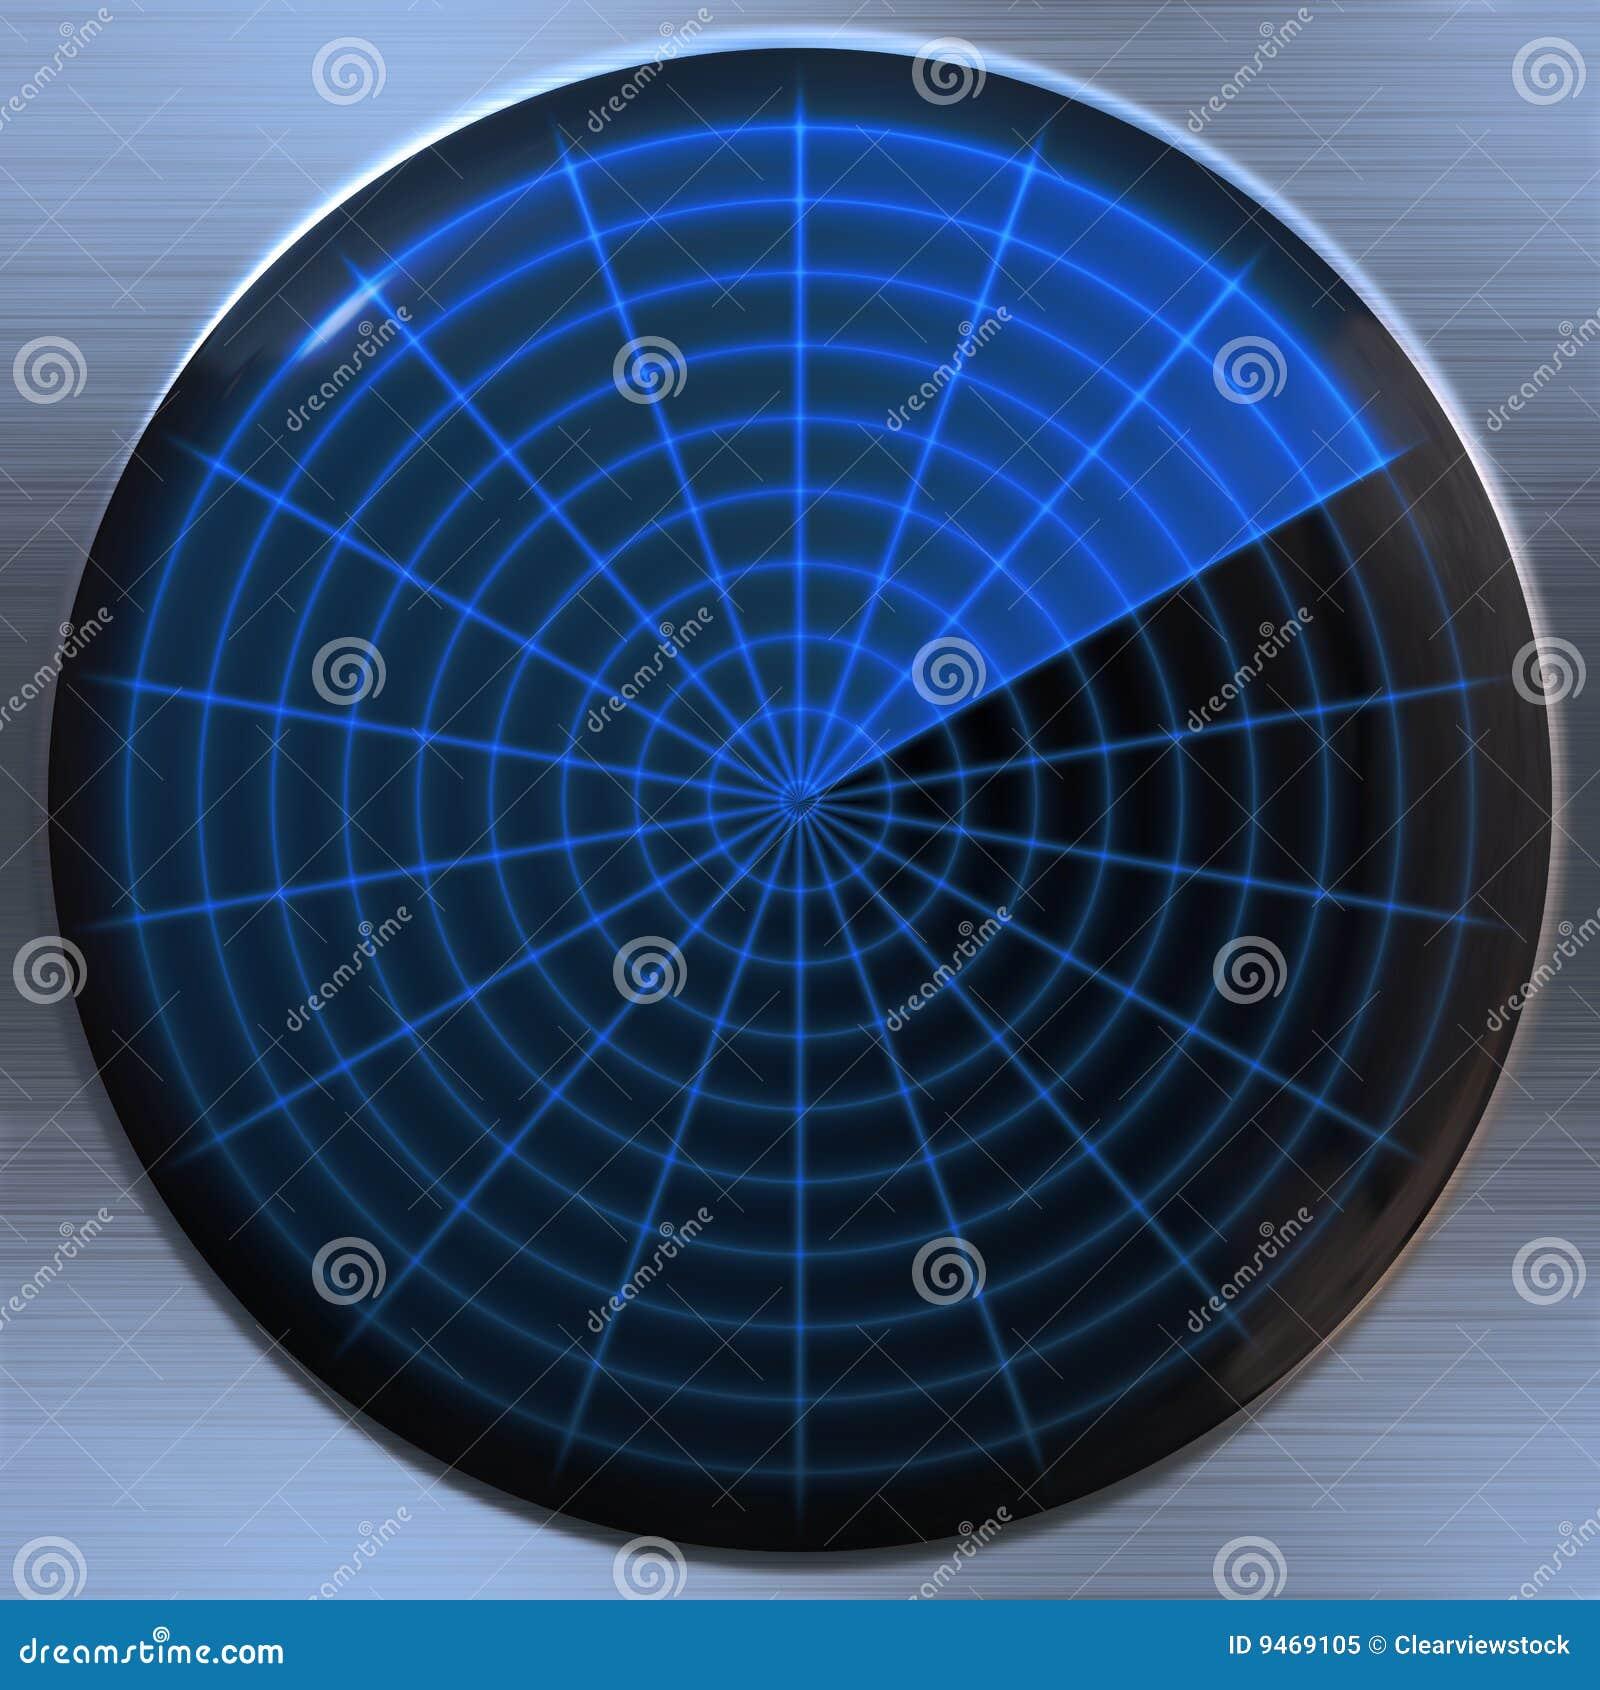 Radar Or Sonar Screen Royalty Free Stock Photo Image 9469105